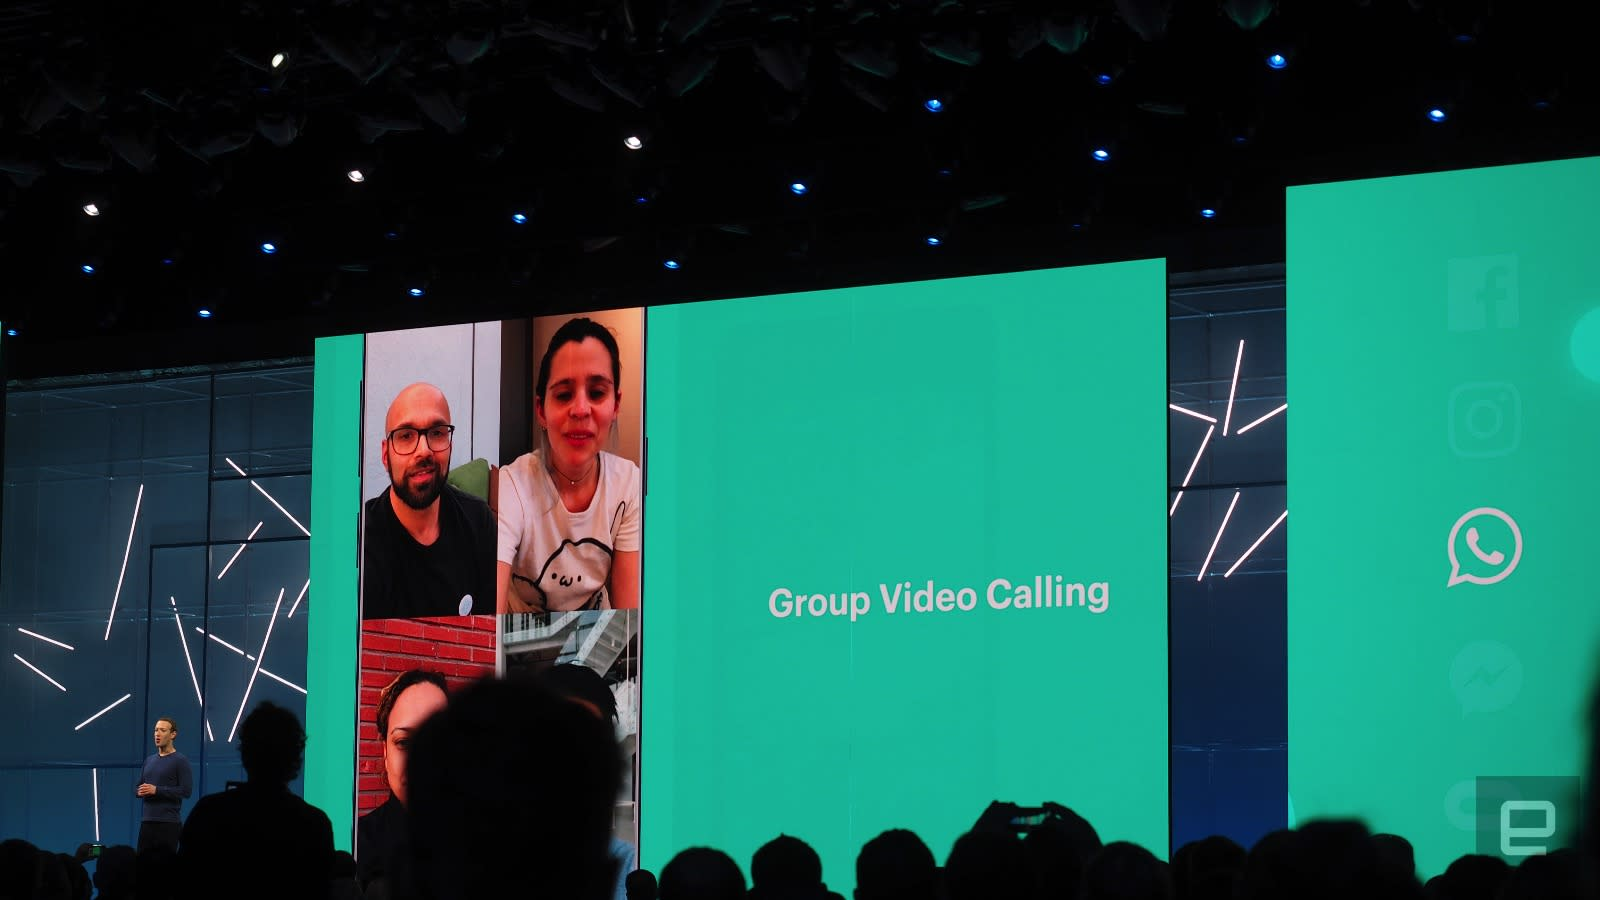 WhatsApp will finally offer group video calls | Engadget